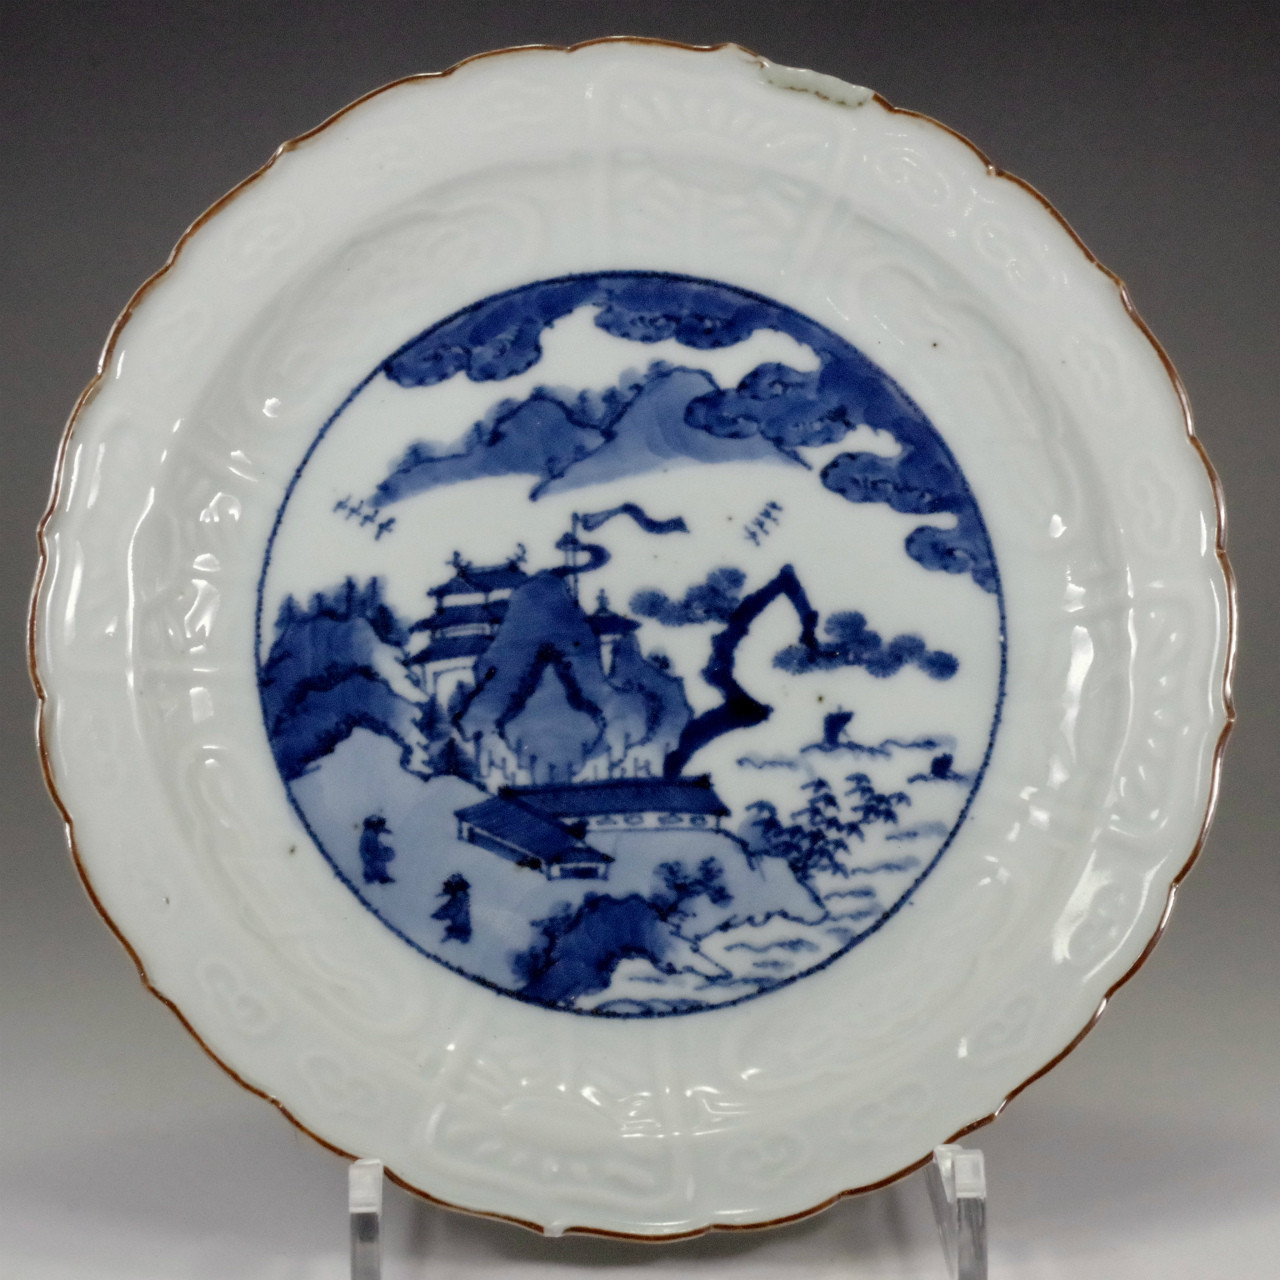 Old Imari - Antique Japanese Blue and White Porcelain Plate in Edo Era #8